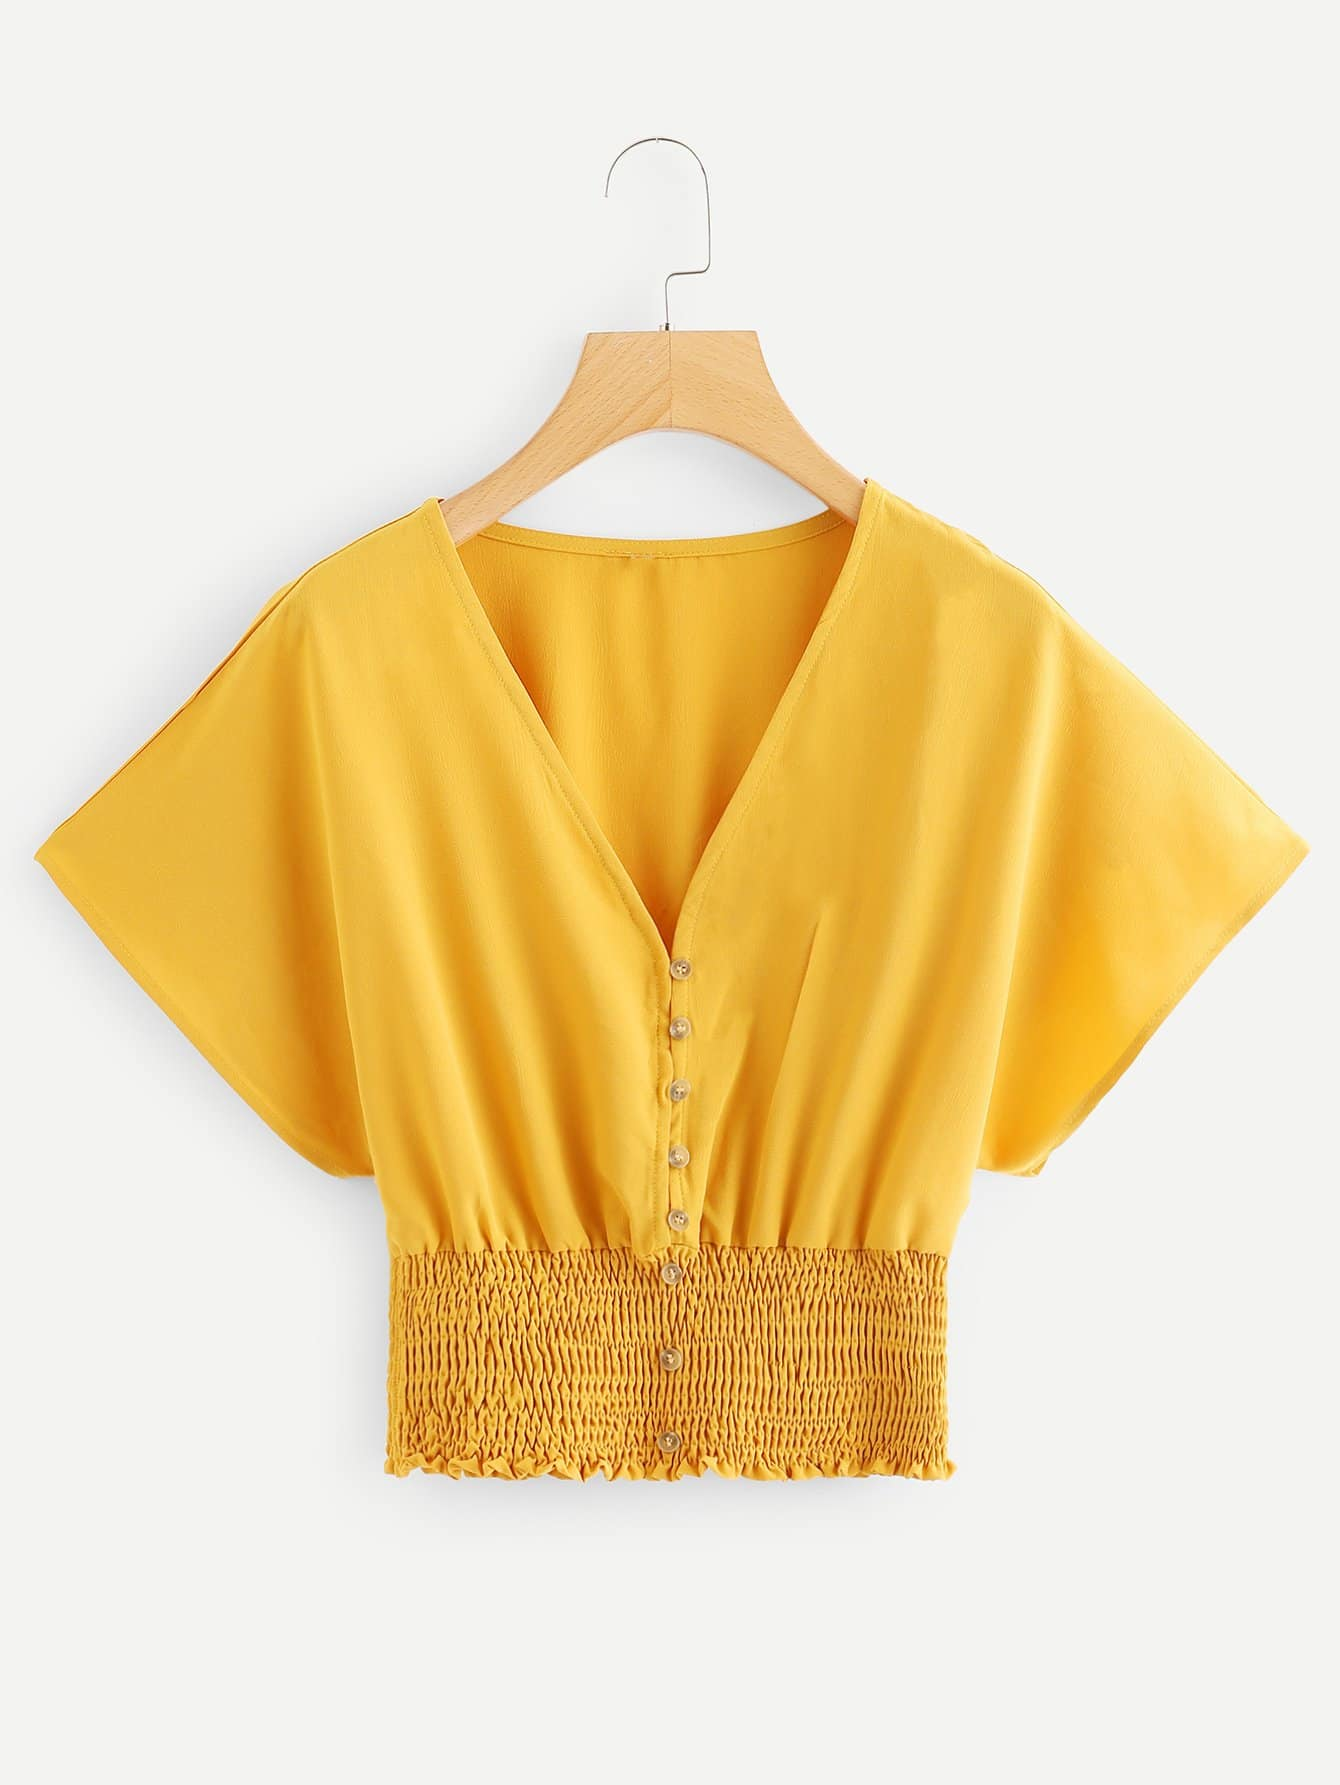 Batwing Sleeve Shirred Hem Button Up Blouse, null, SheIn  - купить со скидкой